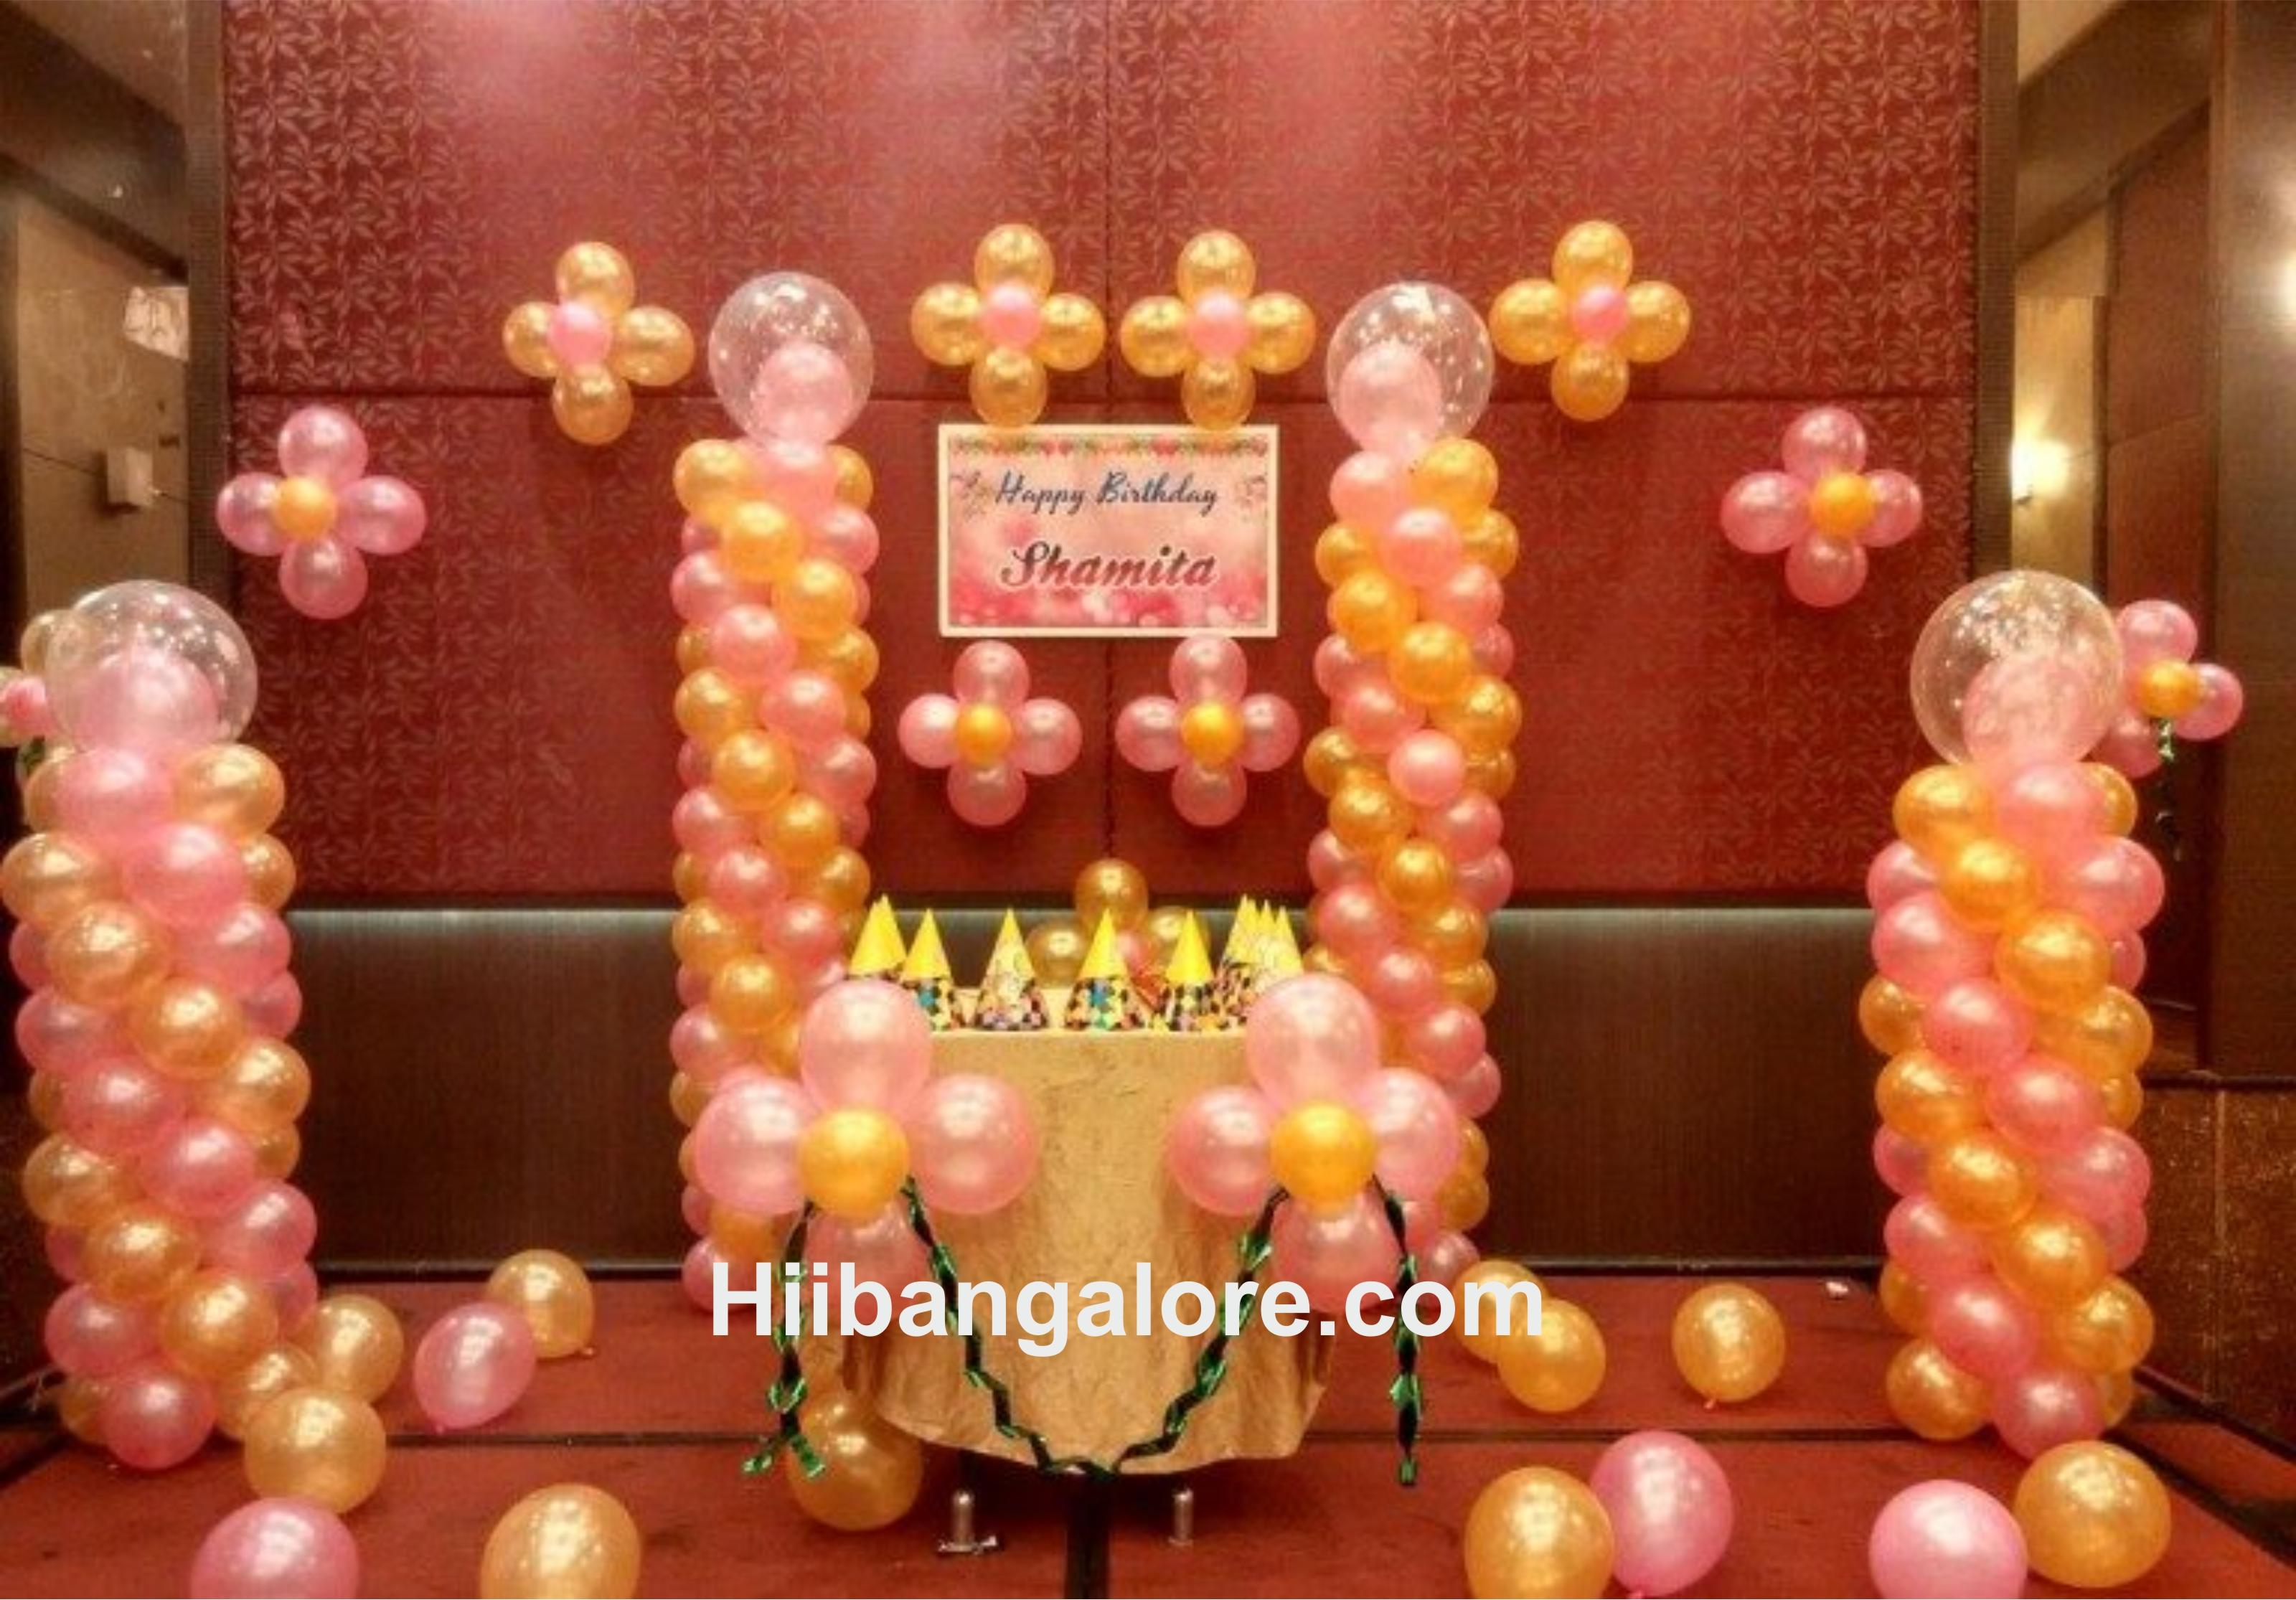 Basic balloon decorations in Bangalore